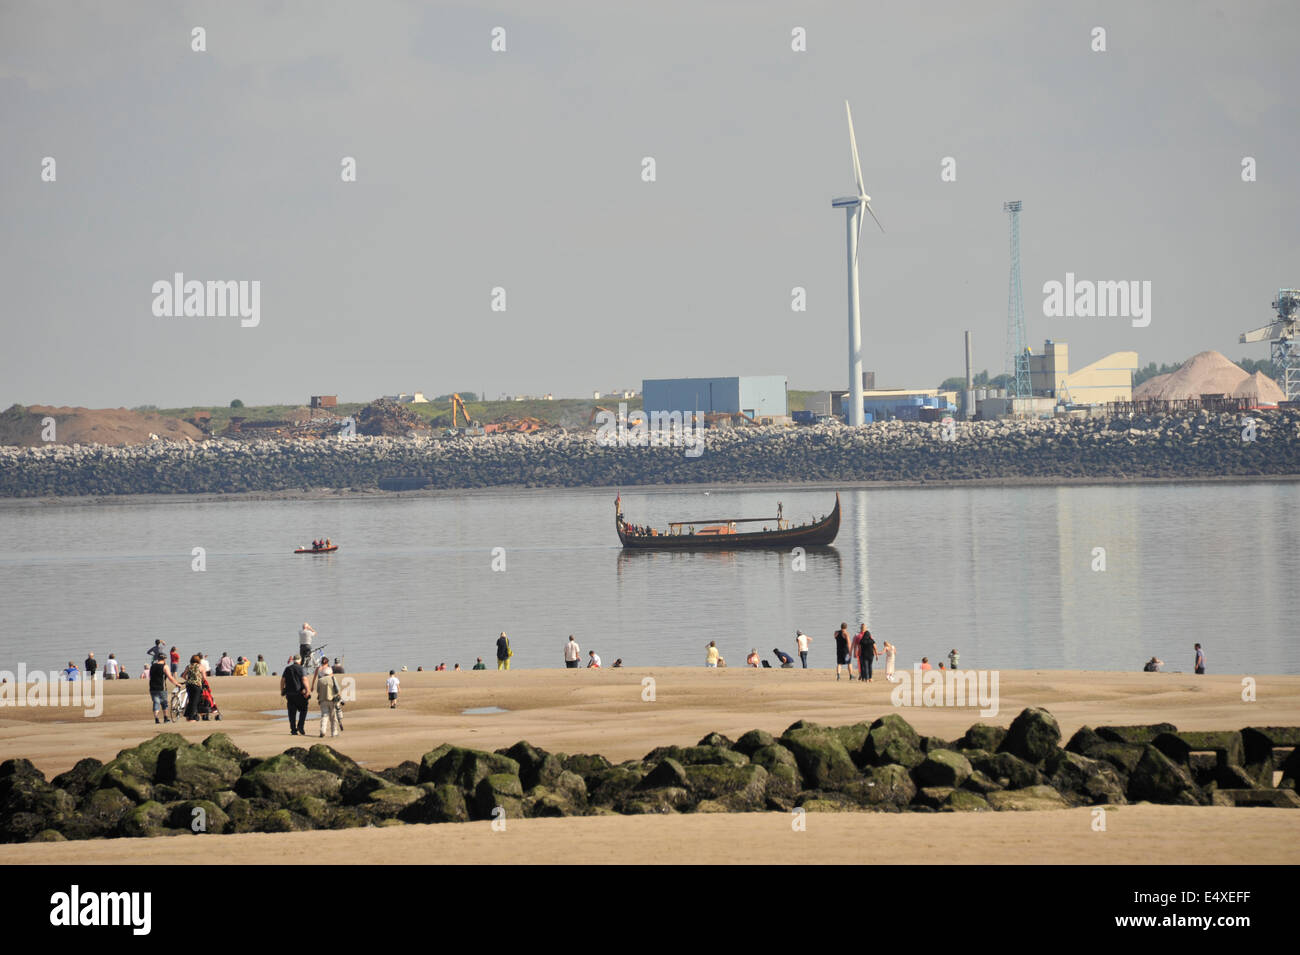 Liverpool, UK. 17th July, 2014. Worlds Largest reconstructed Viking Longship named Draken Harald Harfagre arrived - Stock Image